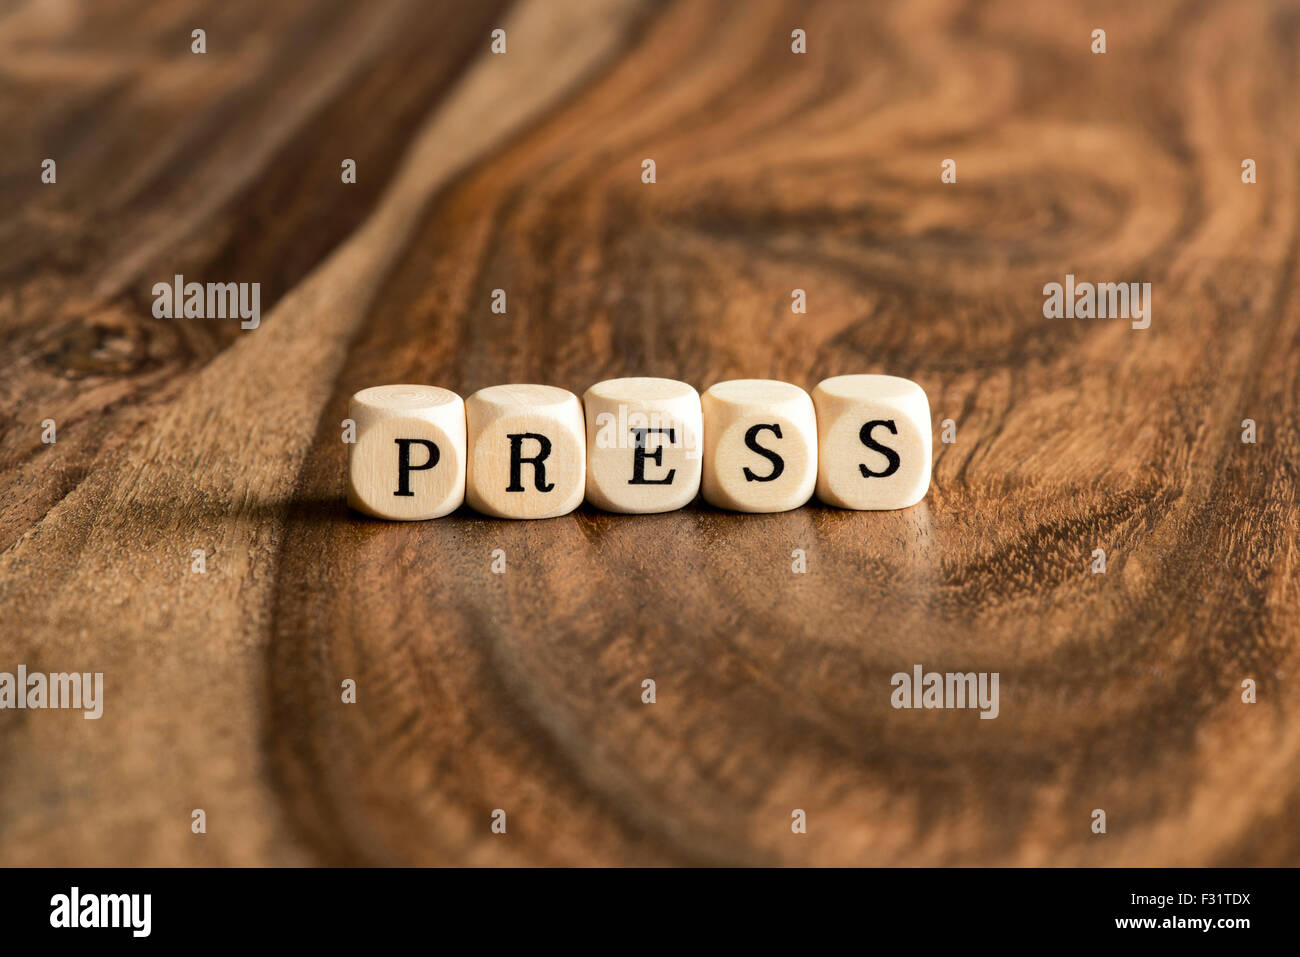 PRESS word background on wood blocks - Stock Image